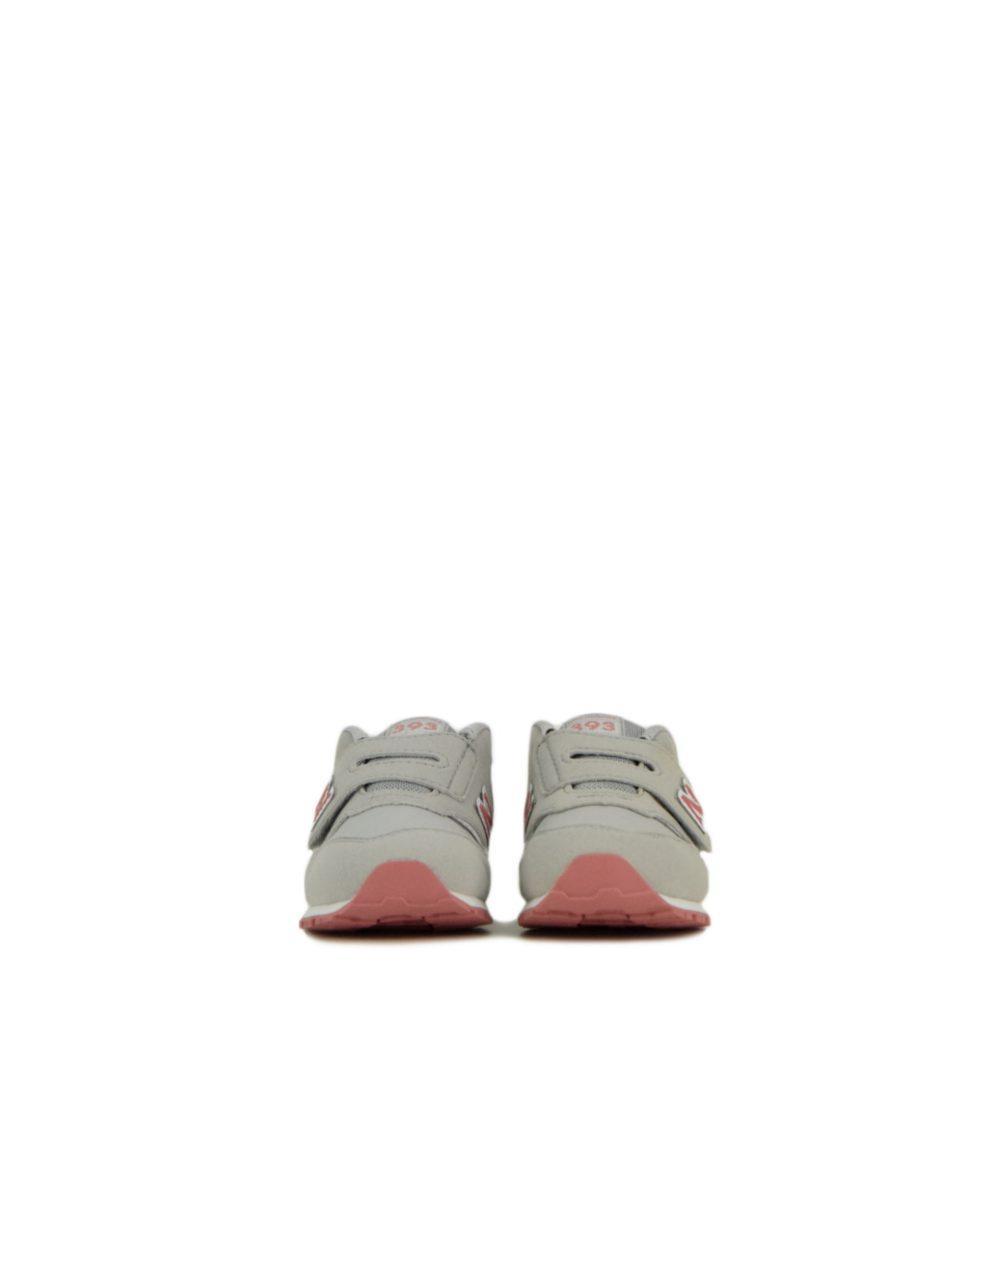 New Balance IV393CGP Light Grey